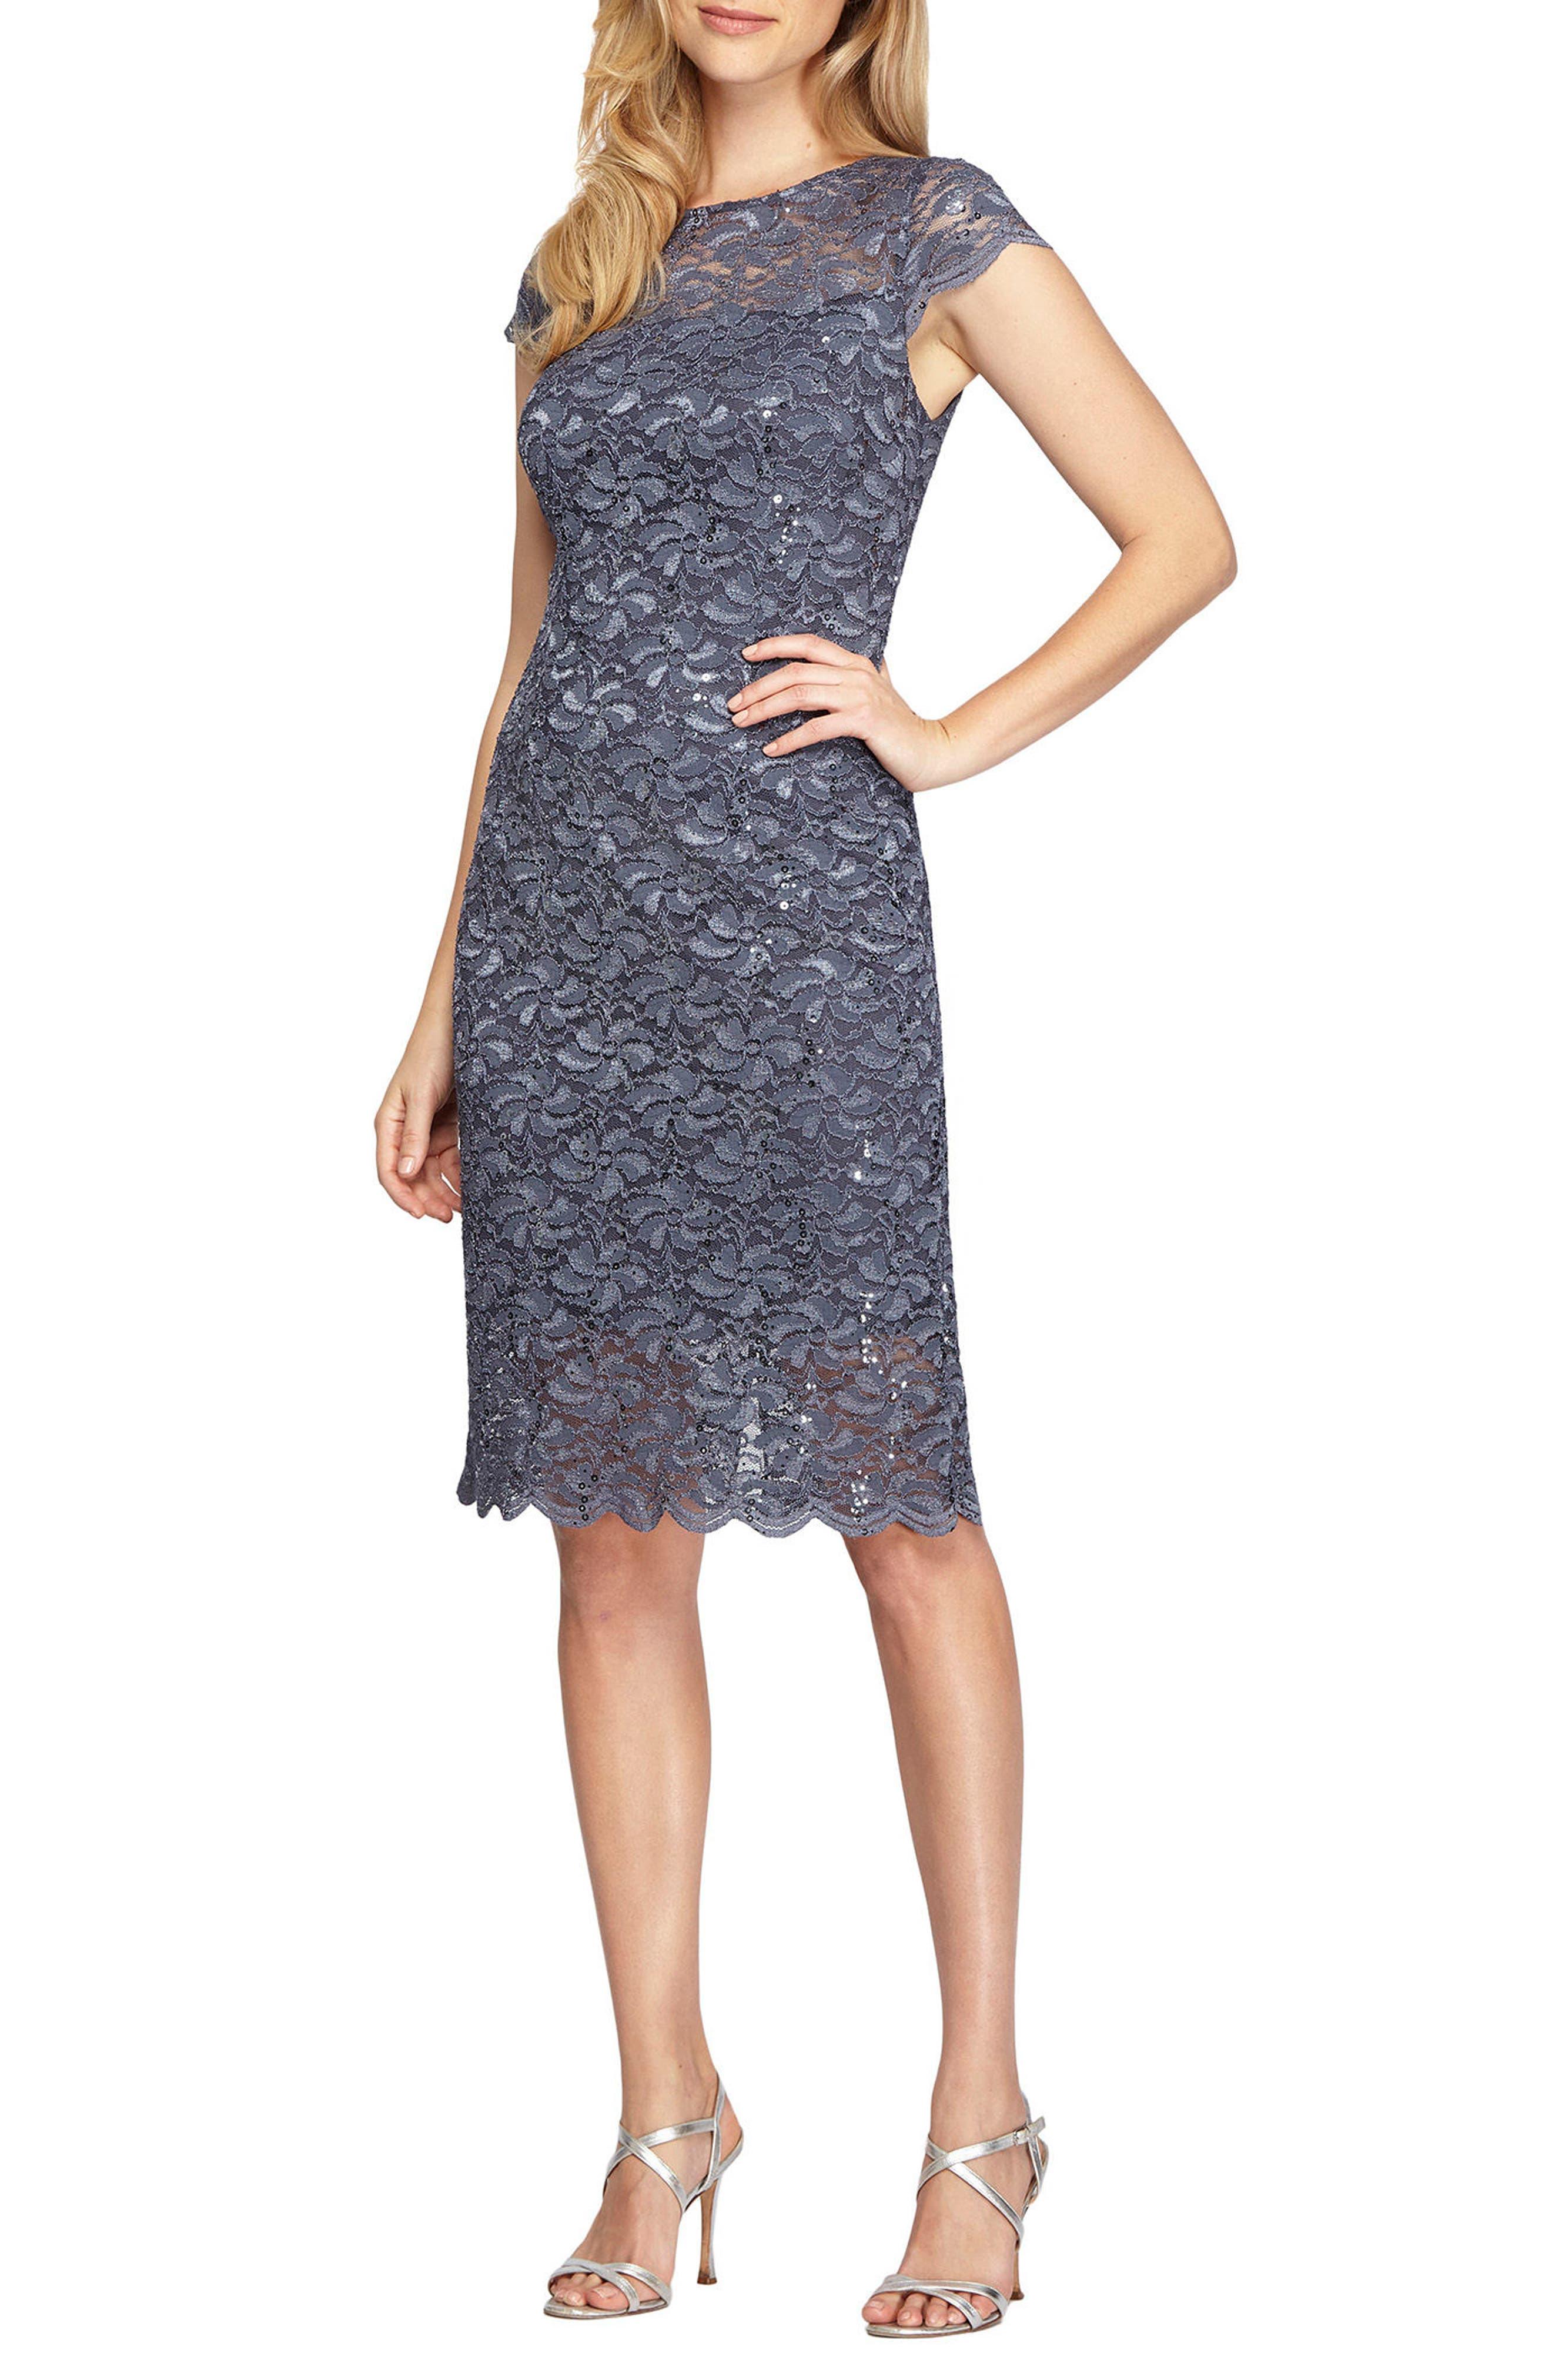 Alternate Image 1 Selected - Alex Evenings Lace Sheath Dress (Regular & Petite)